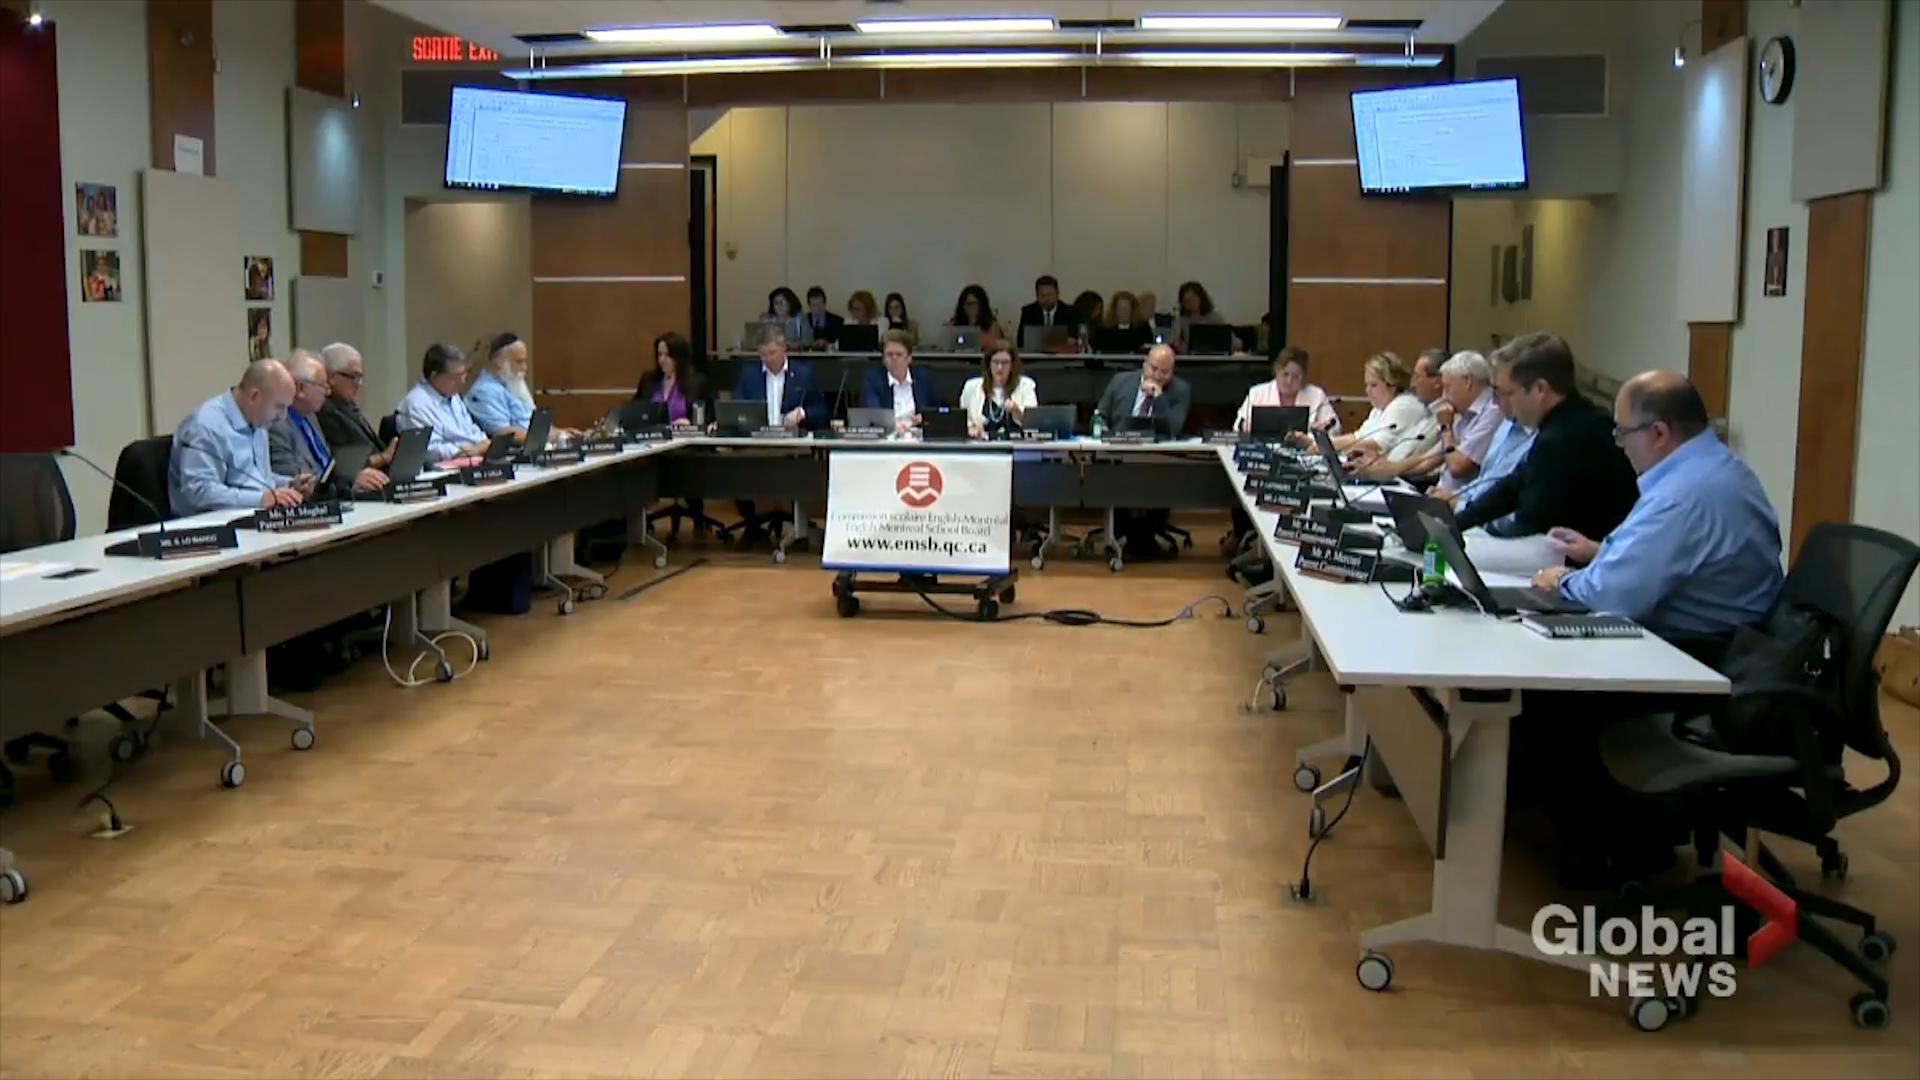 English Montreal School Board contract fraud